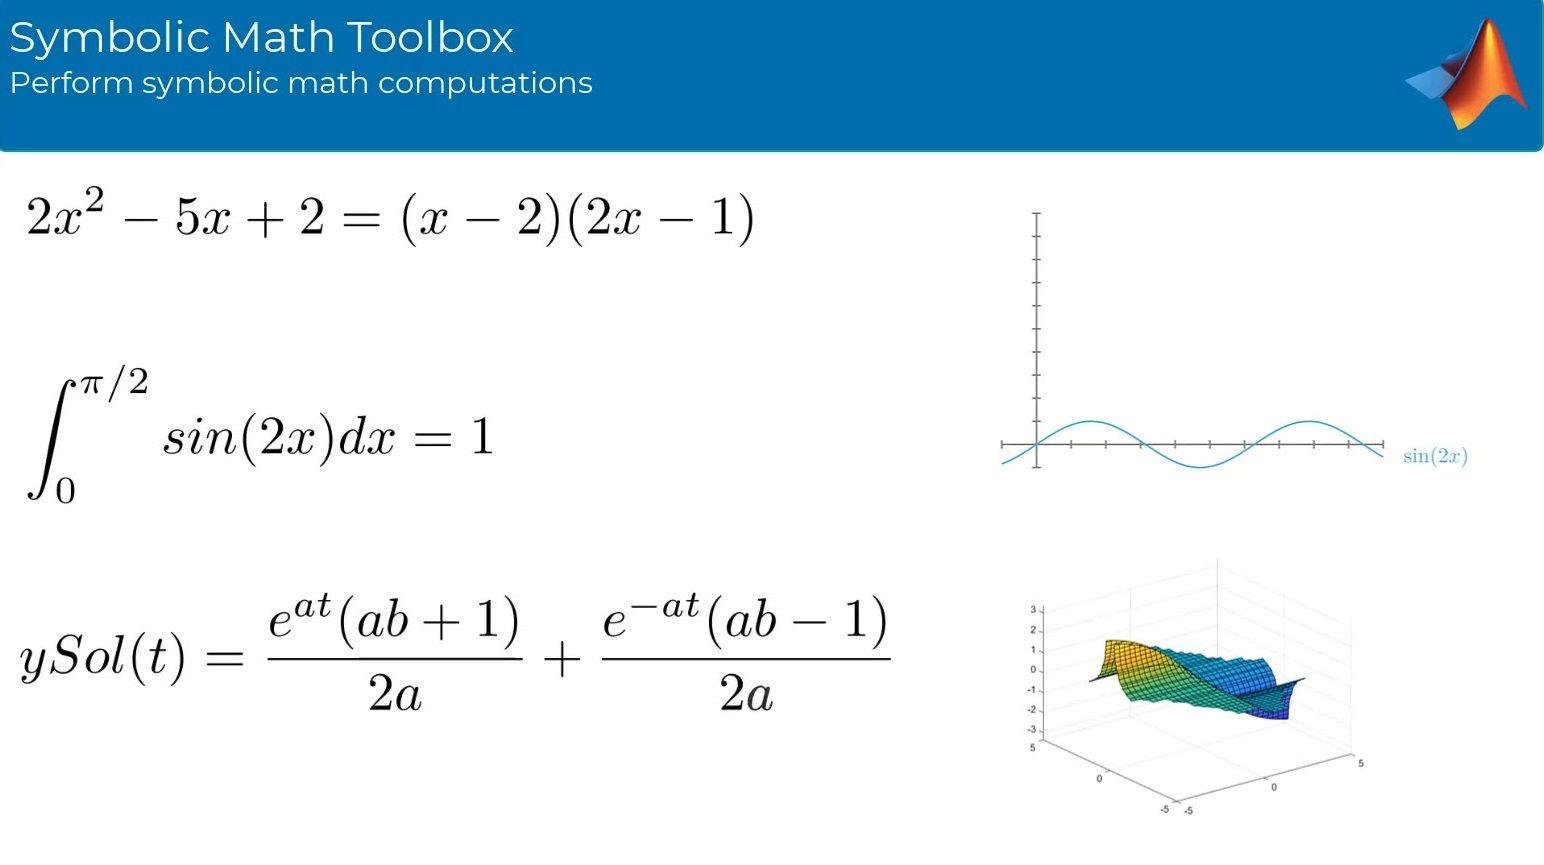 Perform symbolic math computations using Symbolic Math Toolbox. The toolbox provides functions for solving, plotting, and manipulating symbolic math equations.